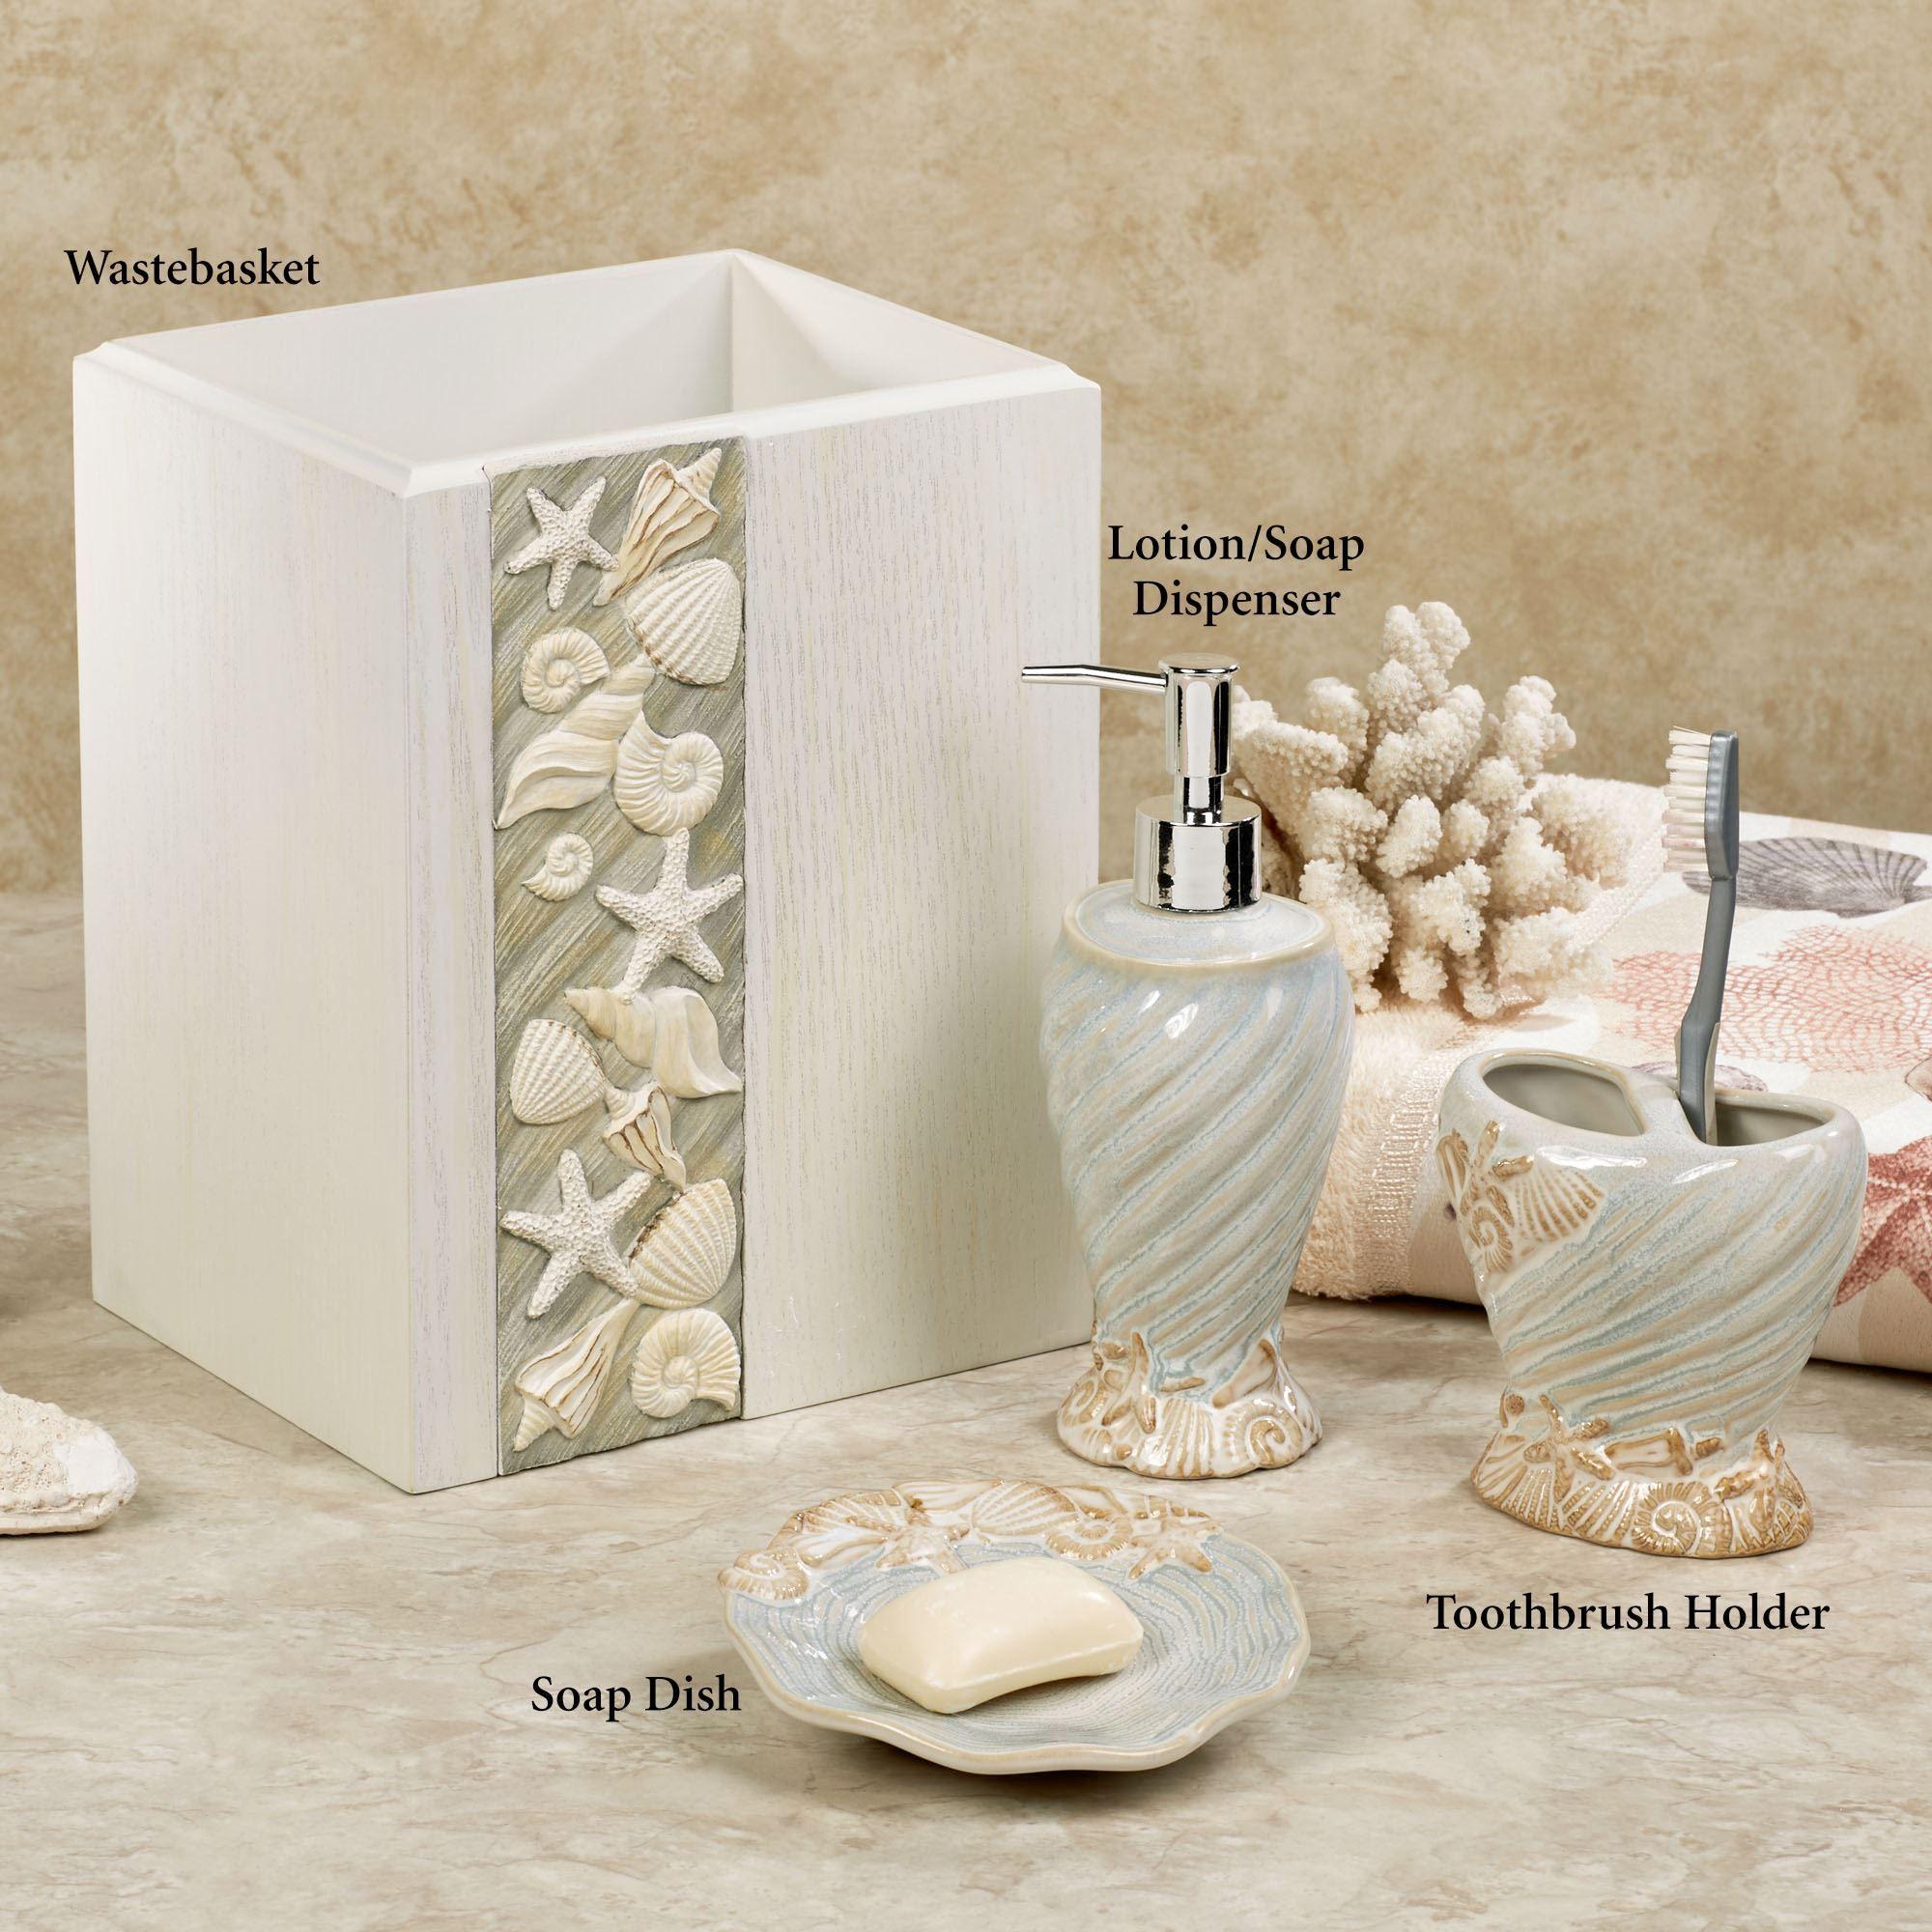 Bathroom Accessories Sets Croscill. Croscill Bathroom Sets Best Of ...